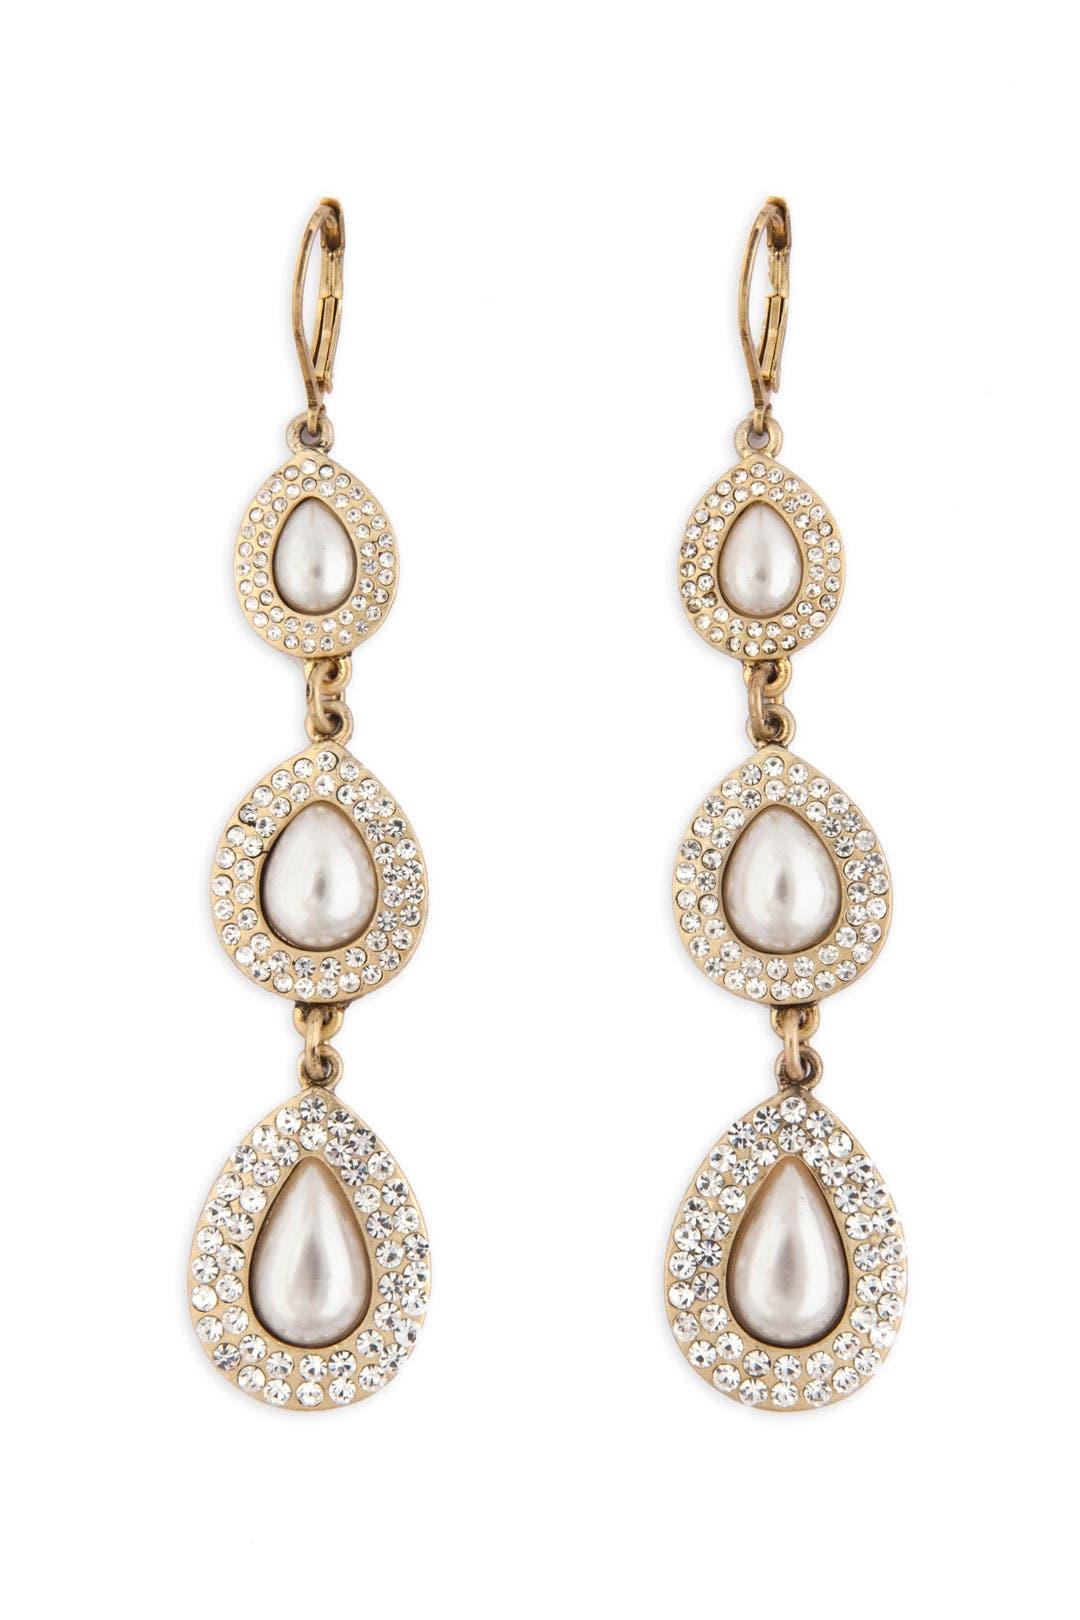 Teardrop Pearl Earrings by Nicole Miller Accessories